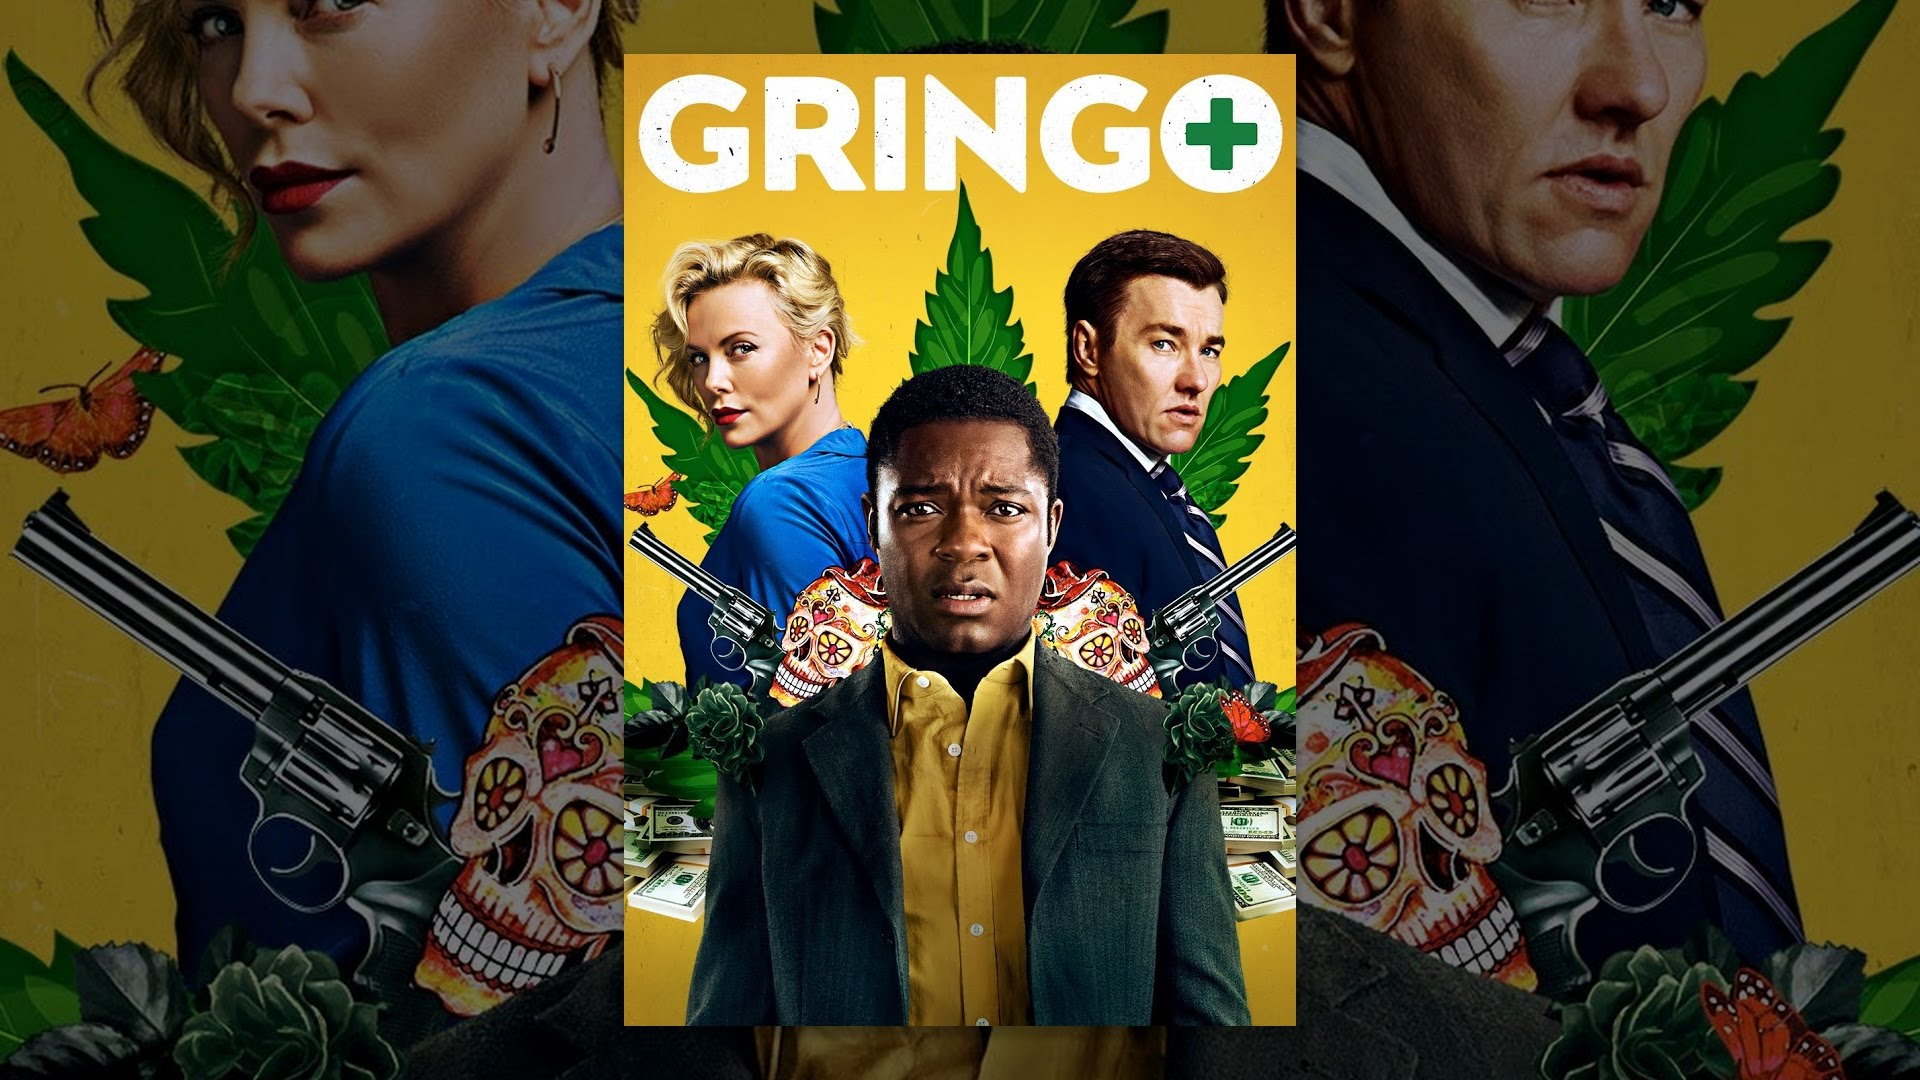 "Gringo ""FULL MOVIE"" (I bought this)"